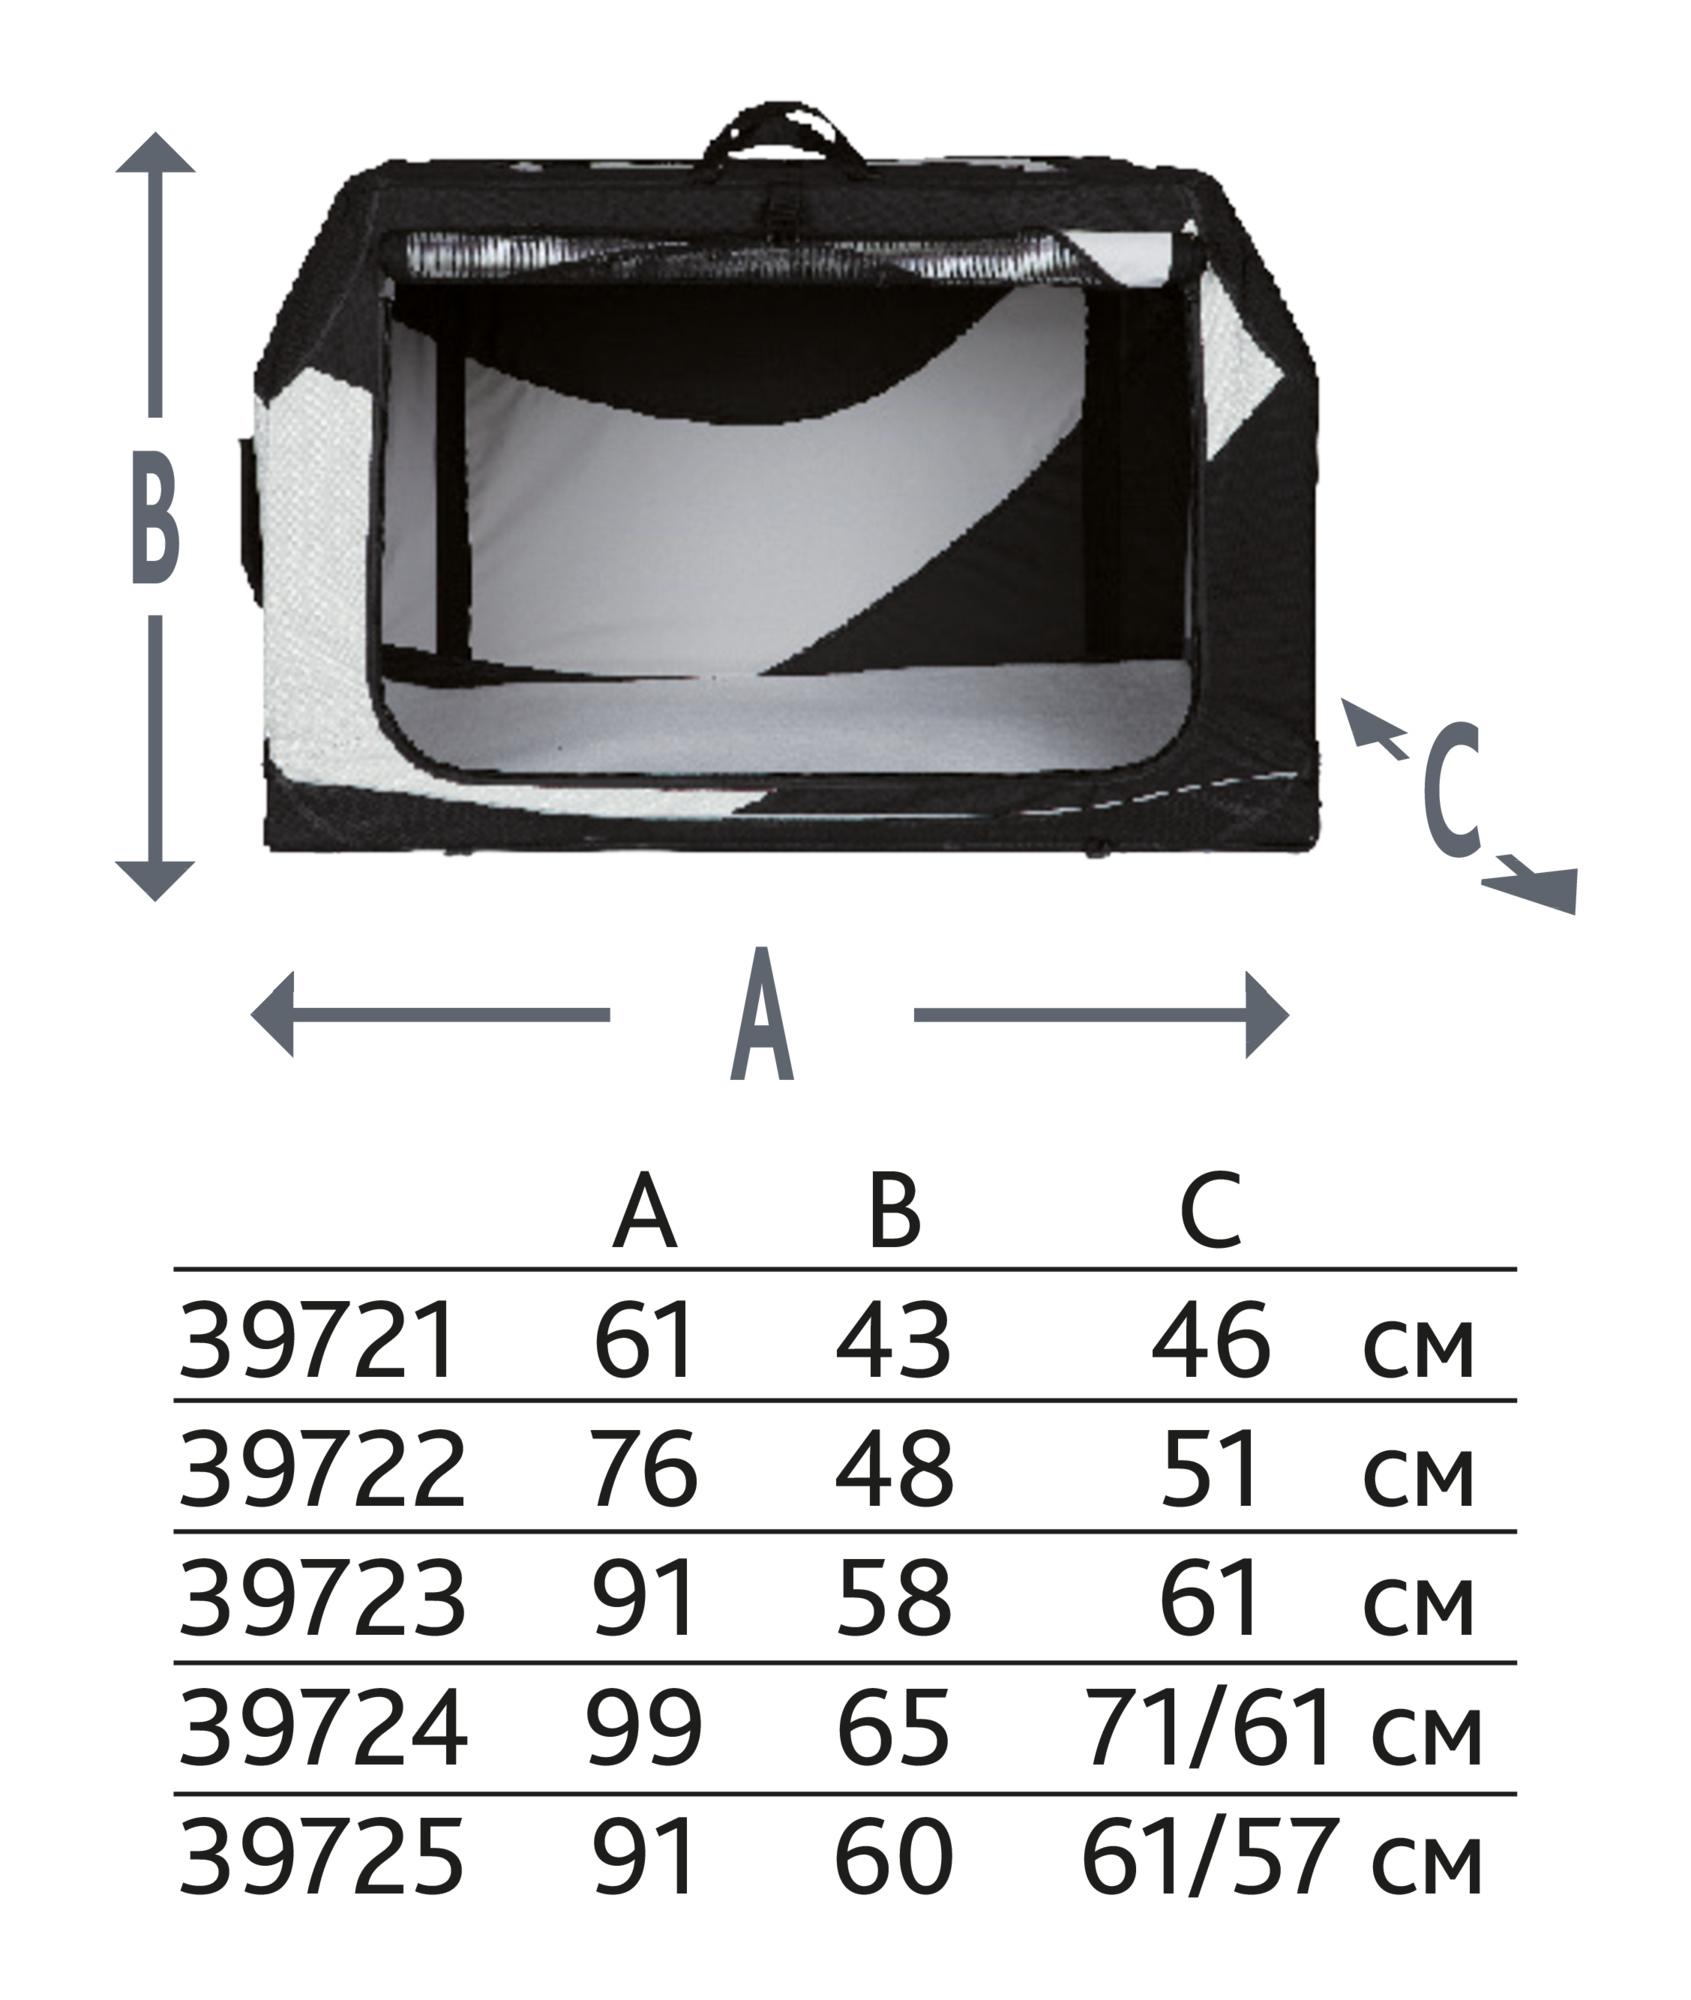 TRIXIE Mobile Kennel Vario TRIXIE Mobile Kennel Vario 50, L: 99 × 65 × 71/61 cm